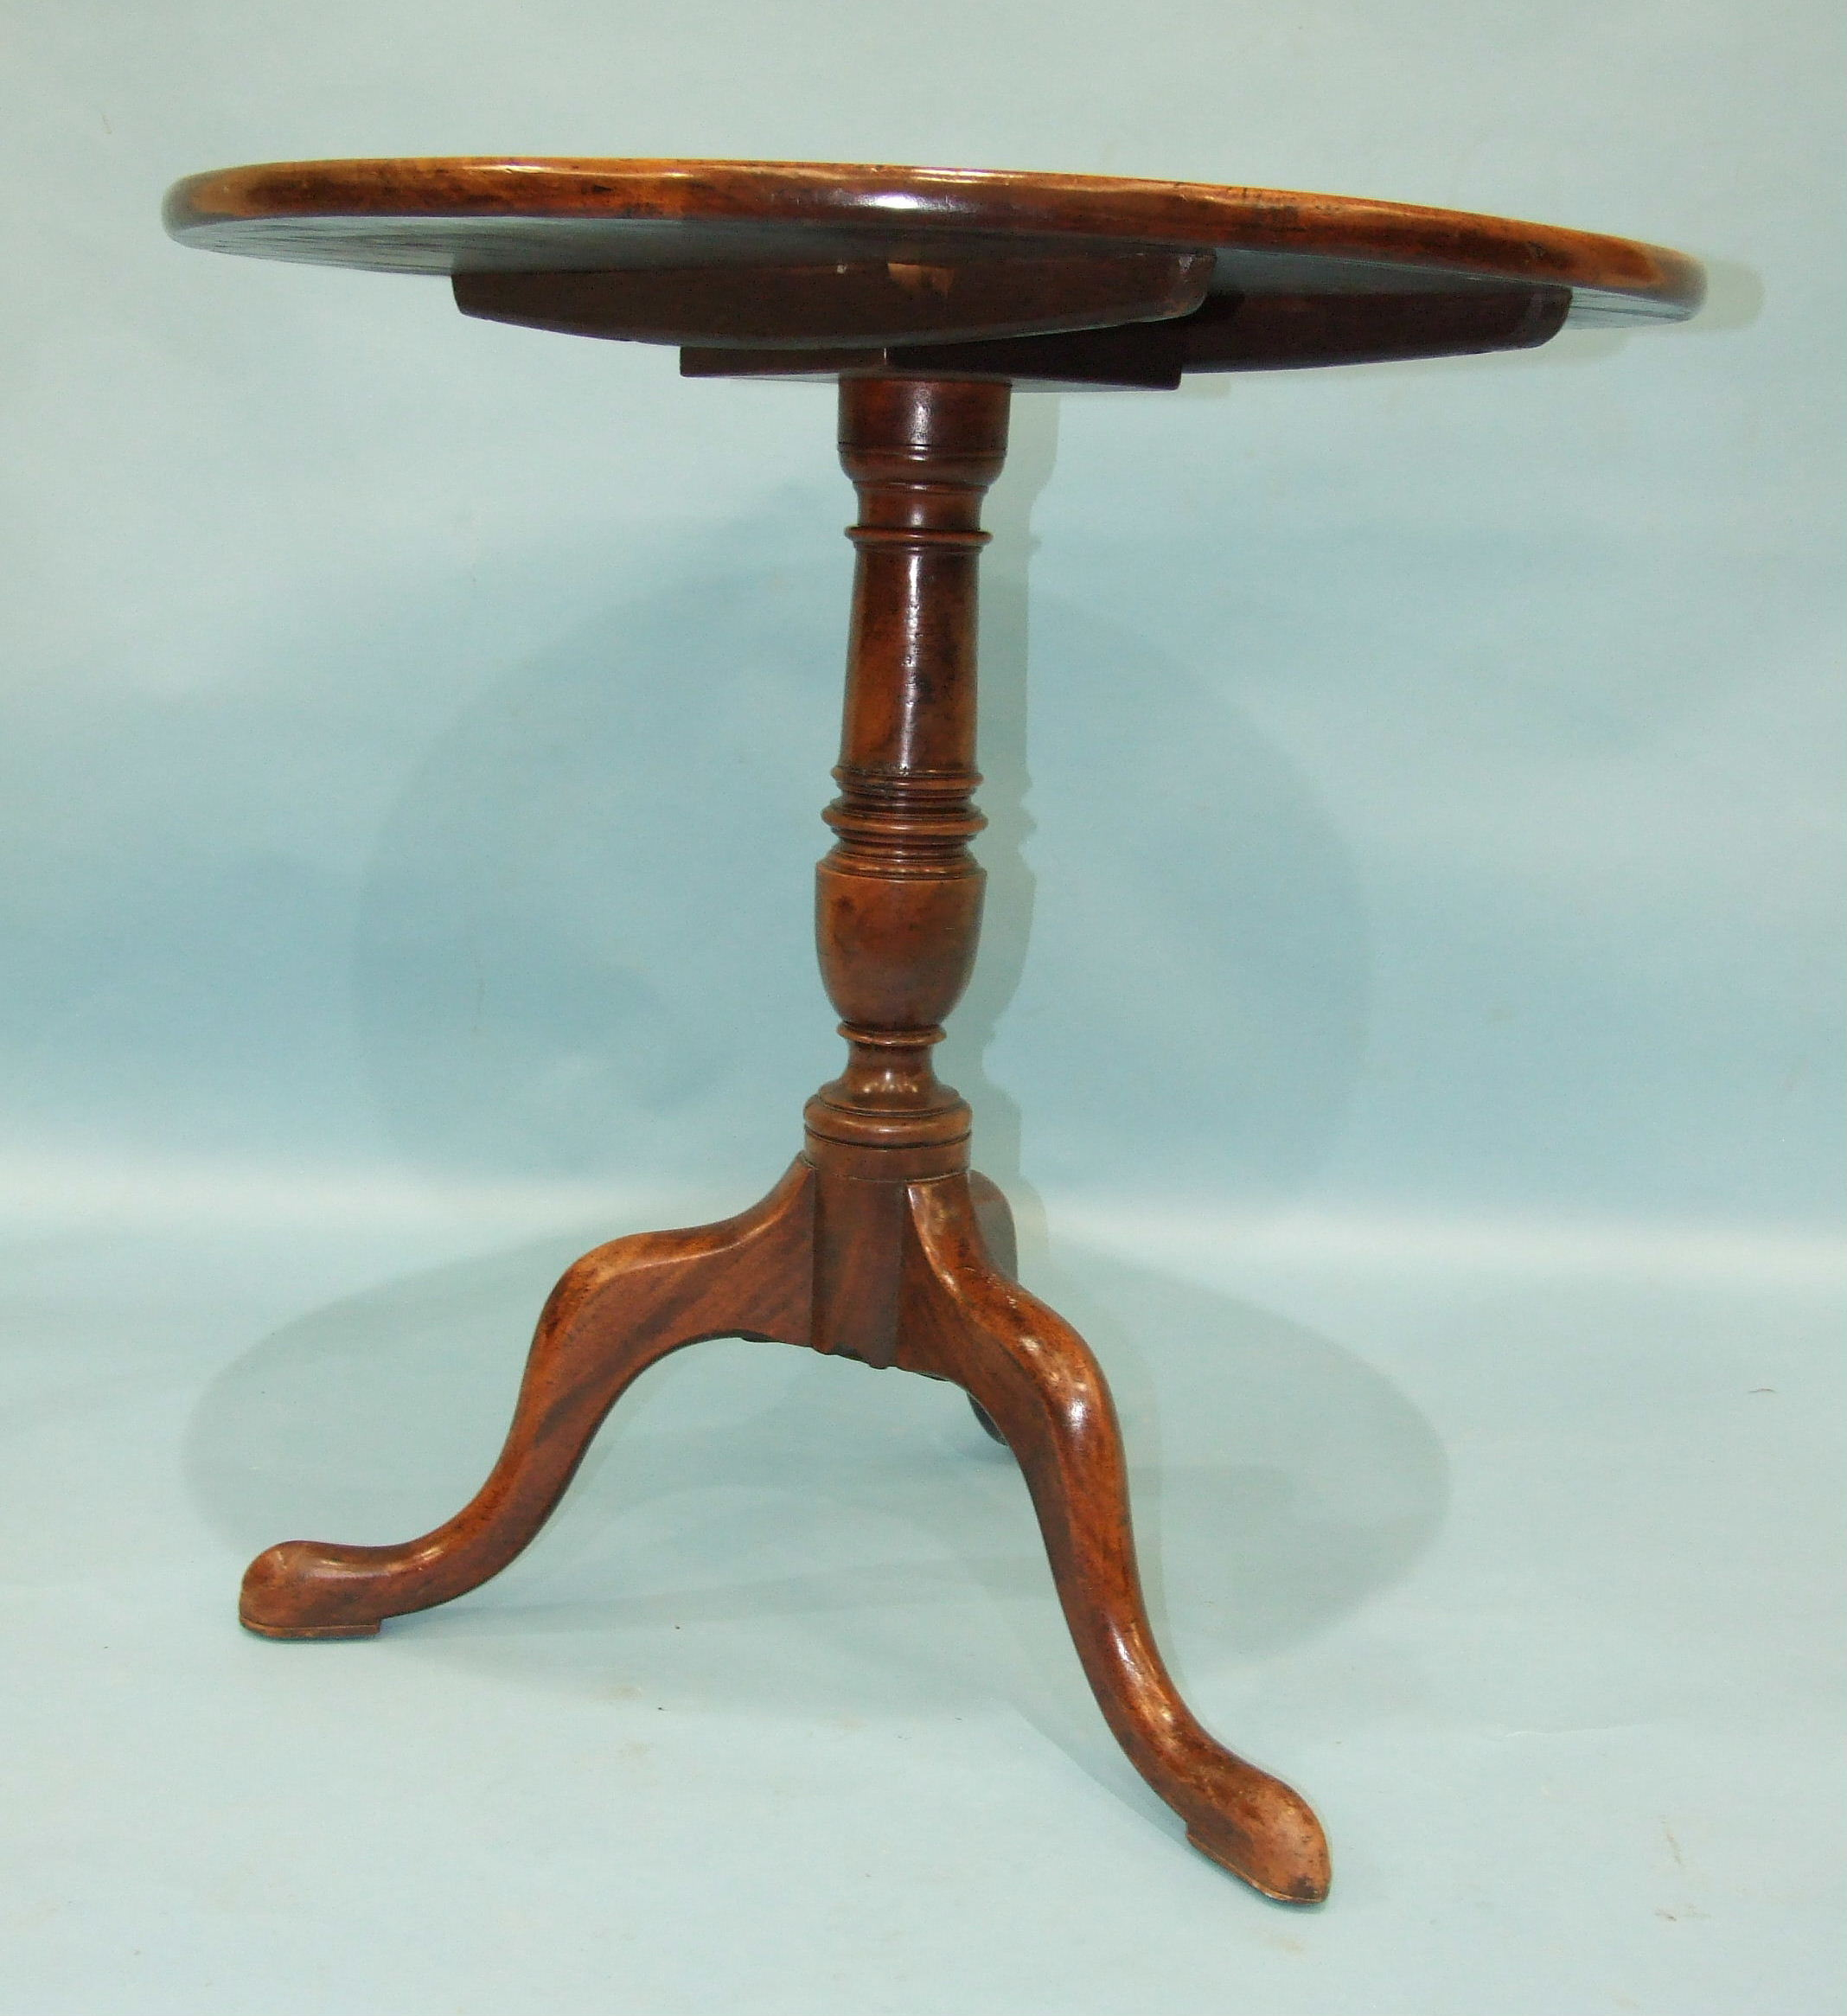 Lot 70 - A Georgian mahogany circular tilt-top table with turned stem and cabriole tripod, 72cm diameter, (